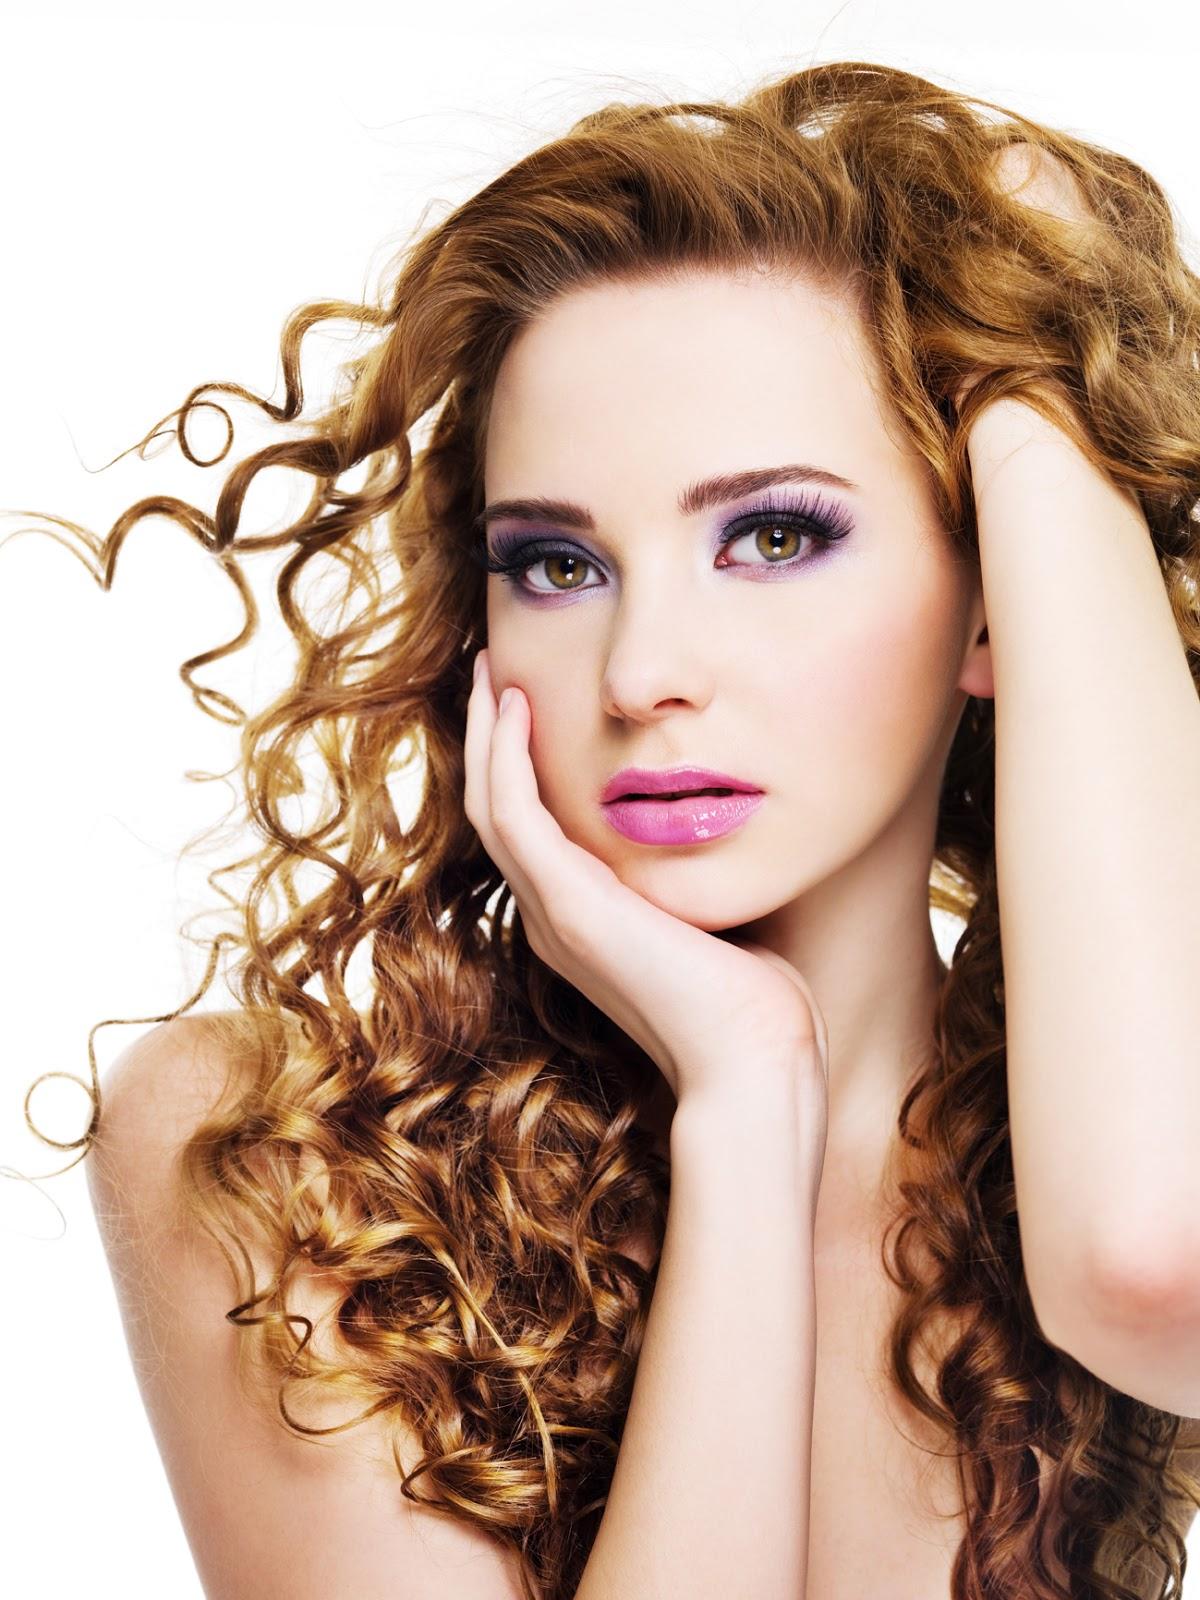 Super dulce peinados para chicas Imagen de tutoriales de color de pelo - Peinados y Moda: Lindos Peinados Rizados para Mujeres Sexys